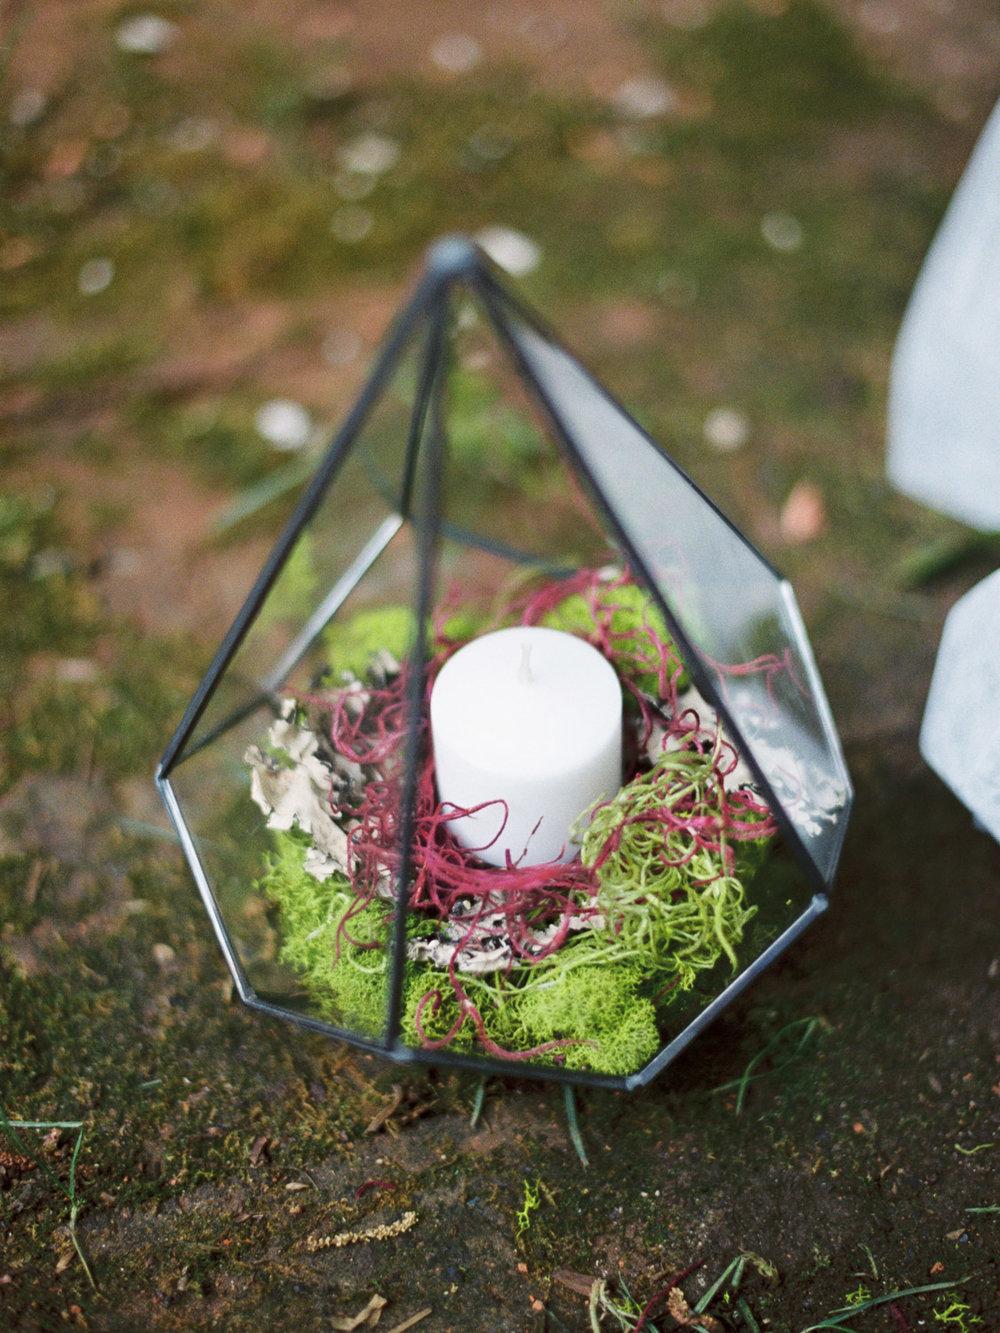 christinadavisphotography-romanticwedding-gardenweddinginspiration51.jpg